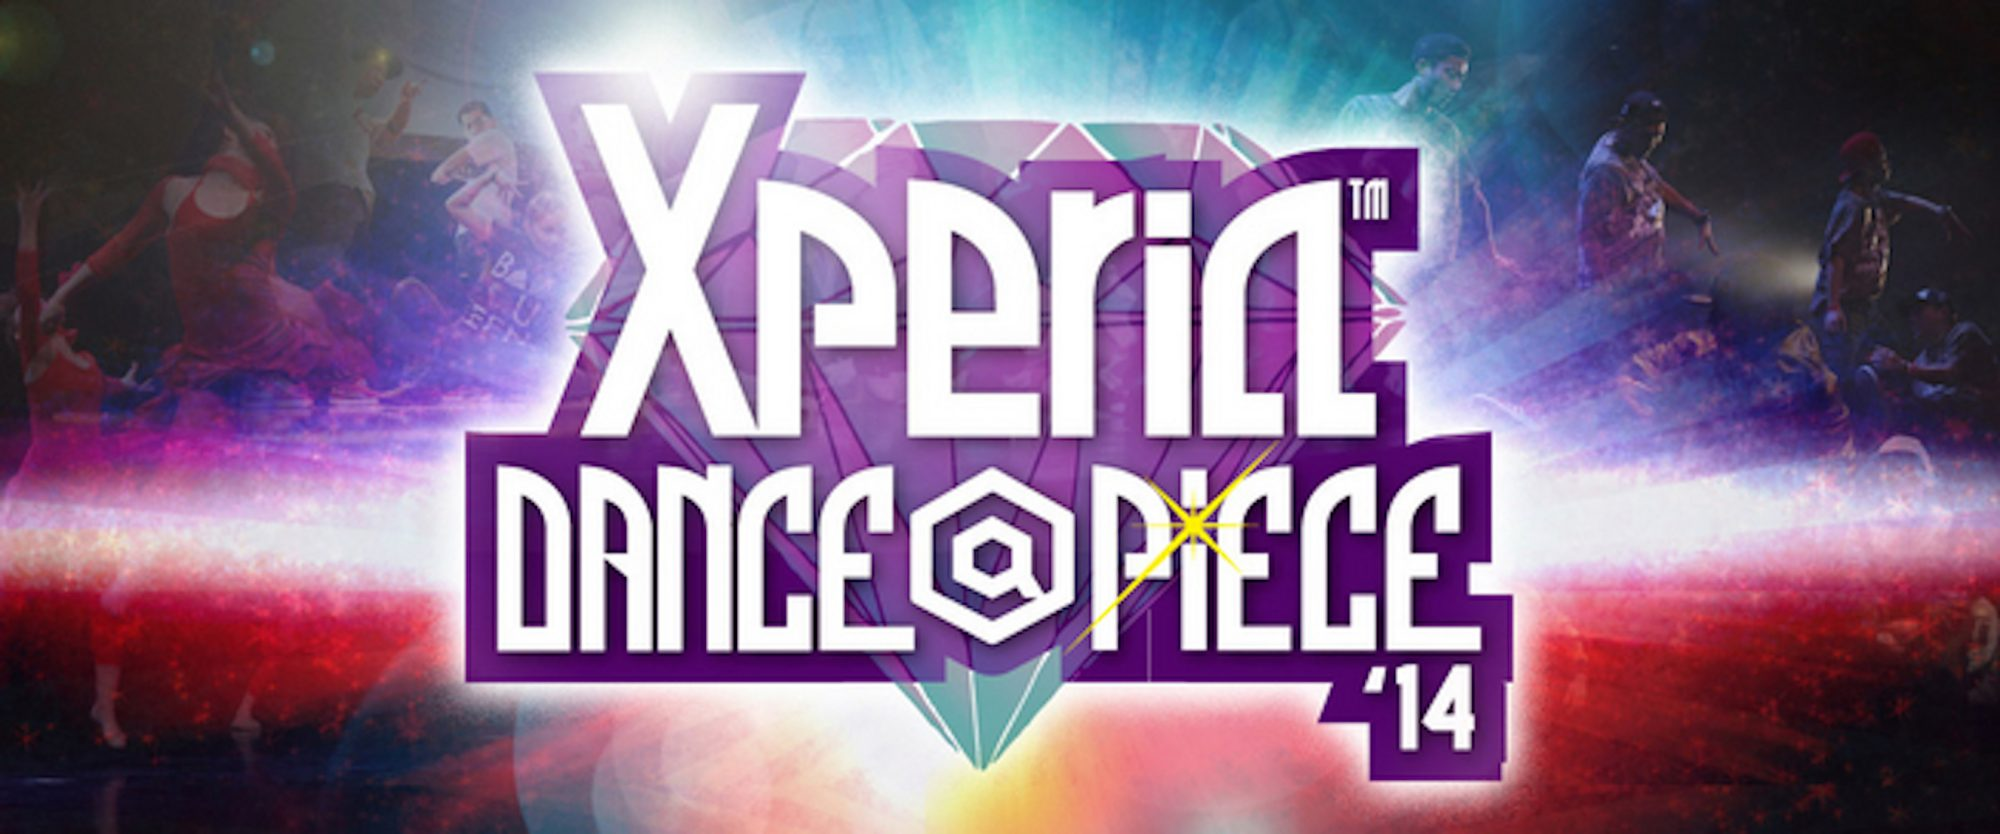 Xperiaの最先端テクノロジーとストリートダンスが融合した 新たな体験を創造するイベント「Xperia™ DANCE@PIECE 2014」開催!